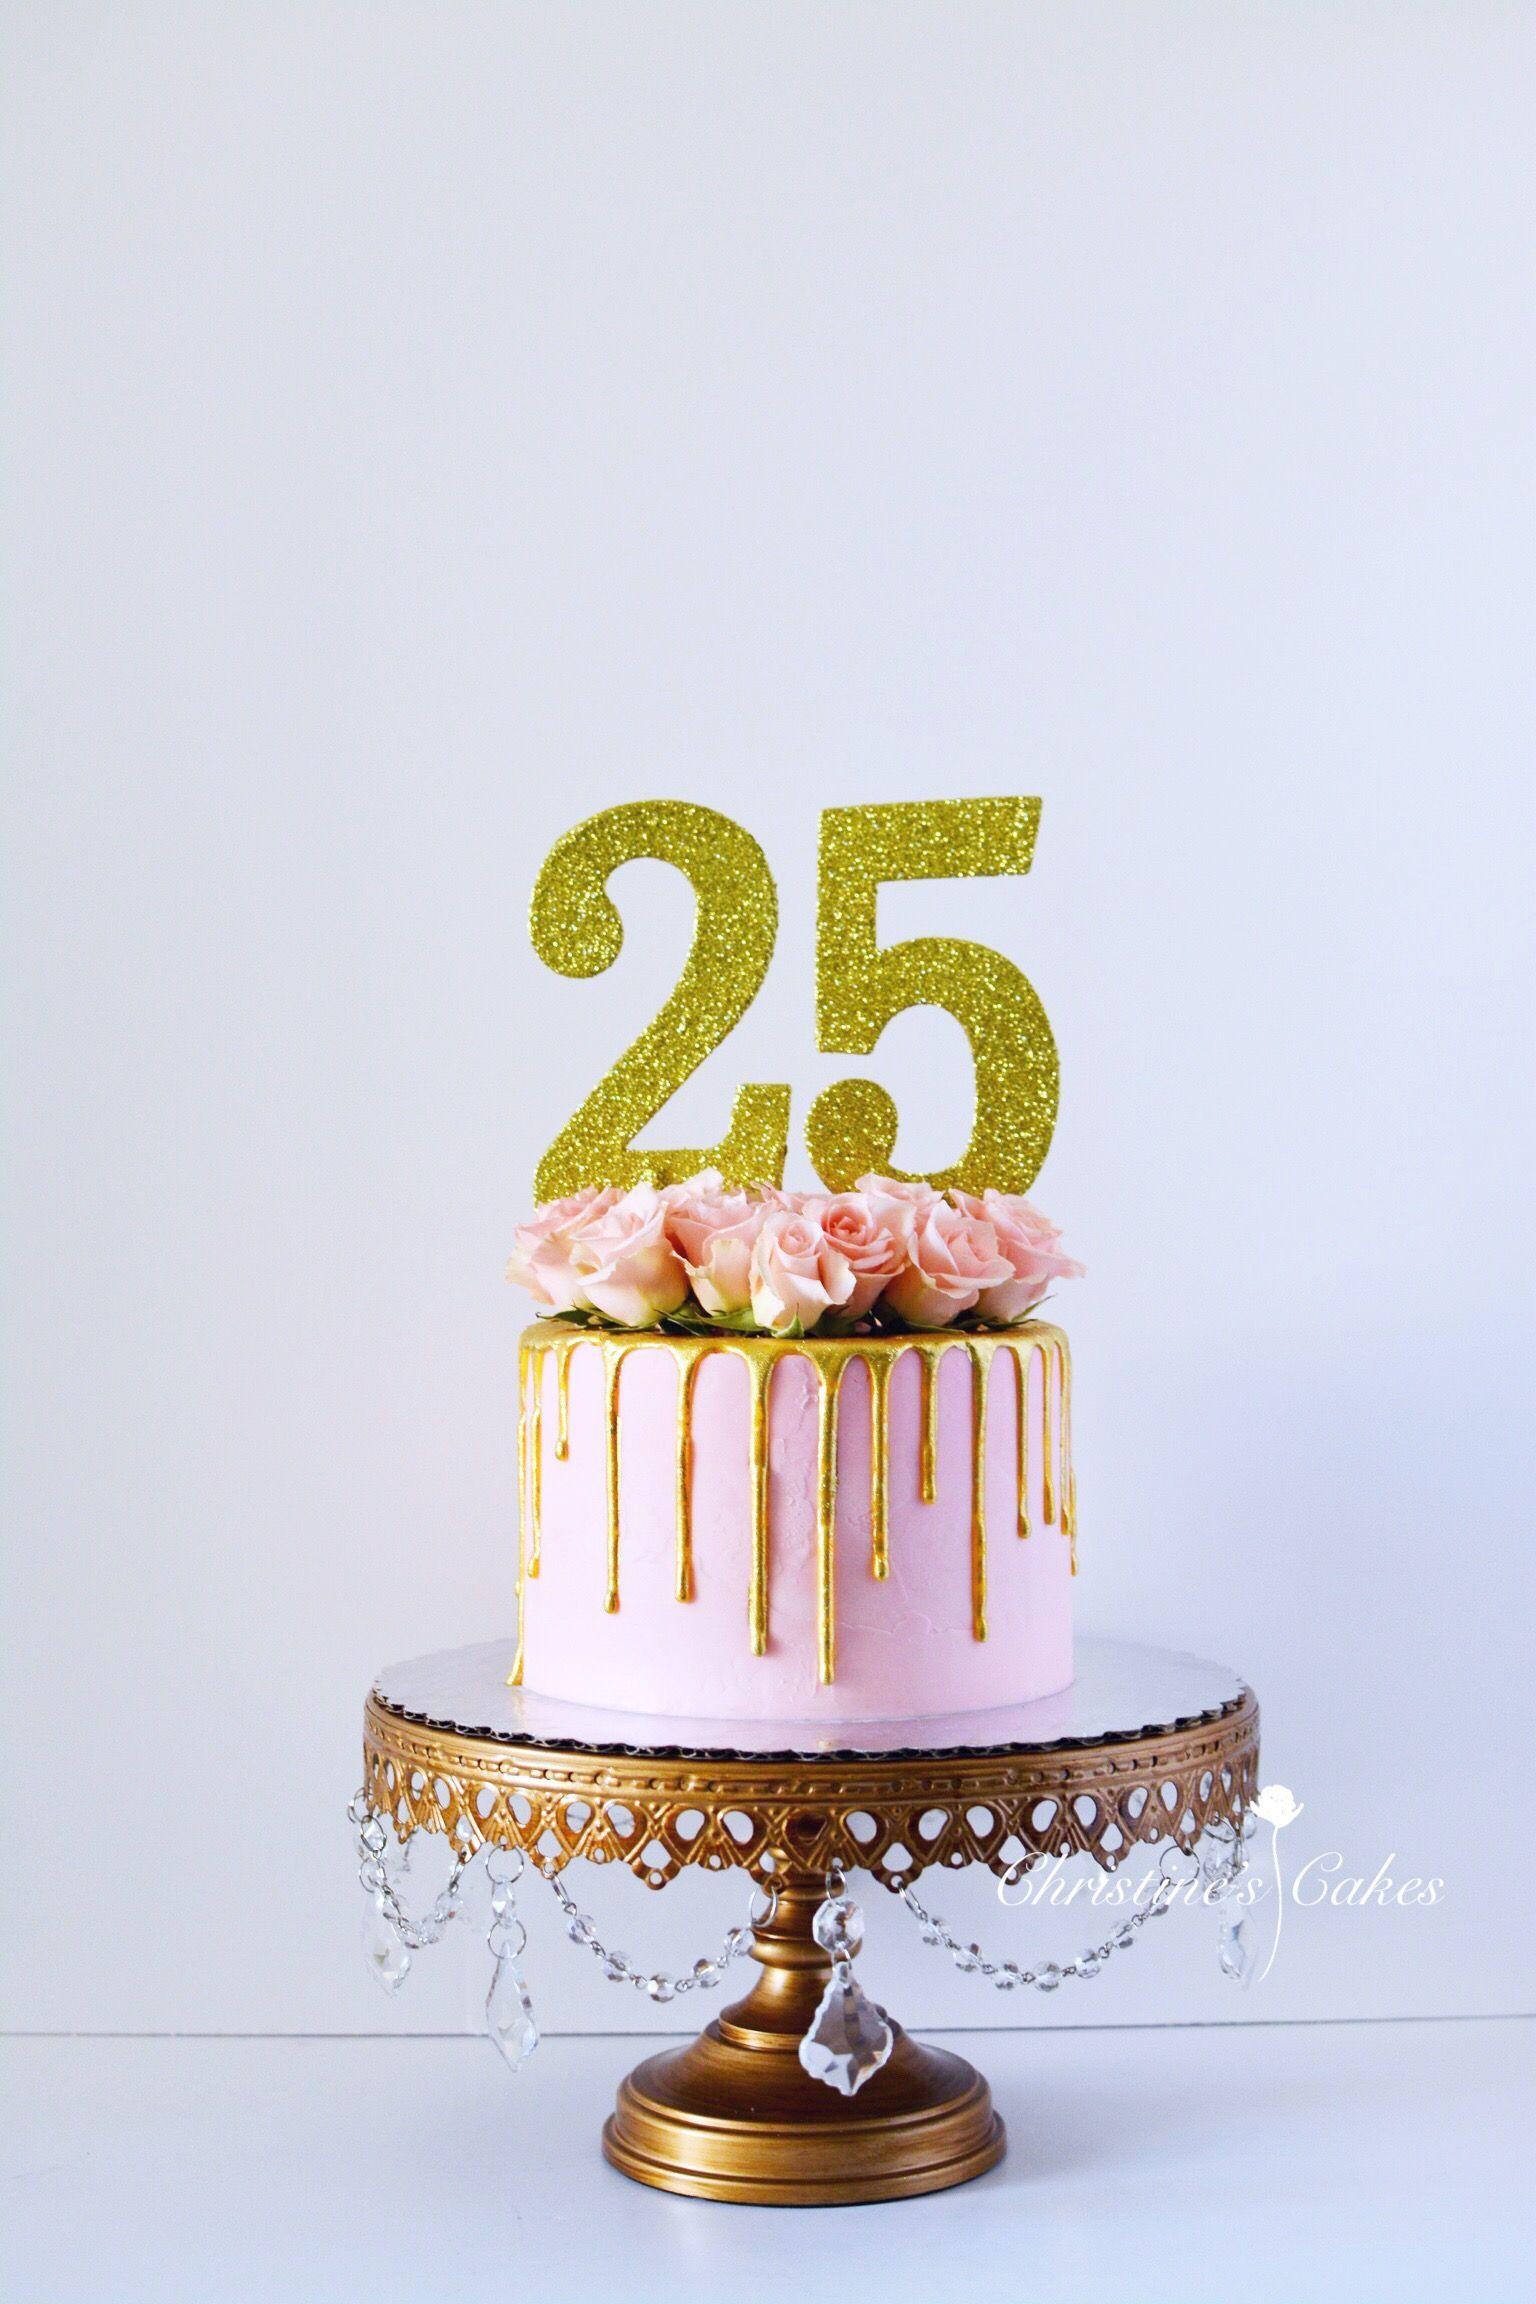 Excellent 27 Amazing Image Of 25 Birthday Cake Verjaardagstaart Ideeen Personalised Birthday Cards Paralily Jamesorg